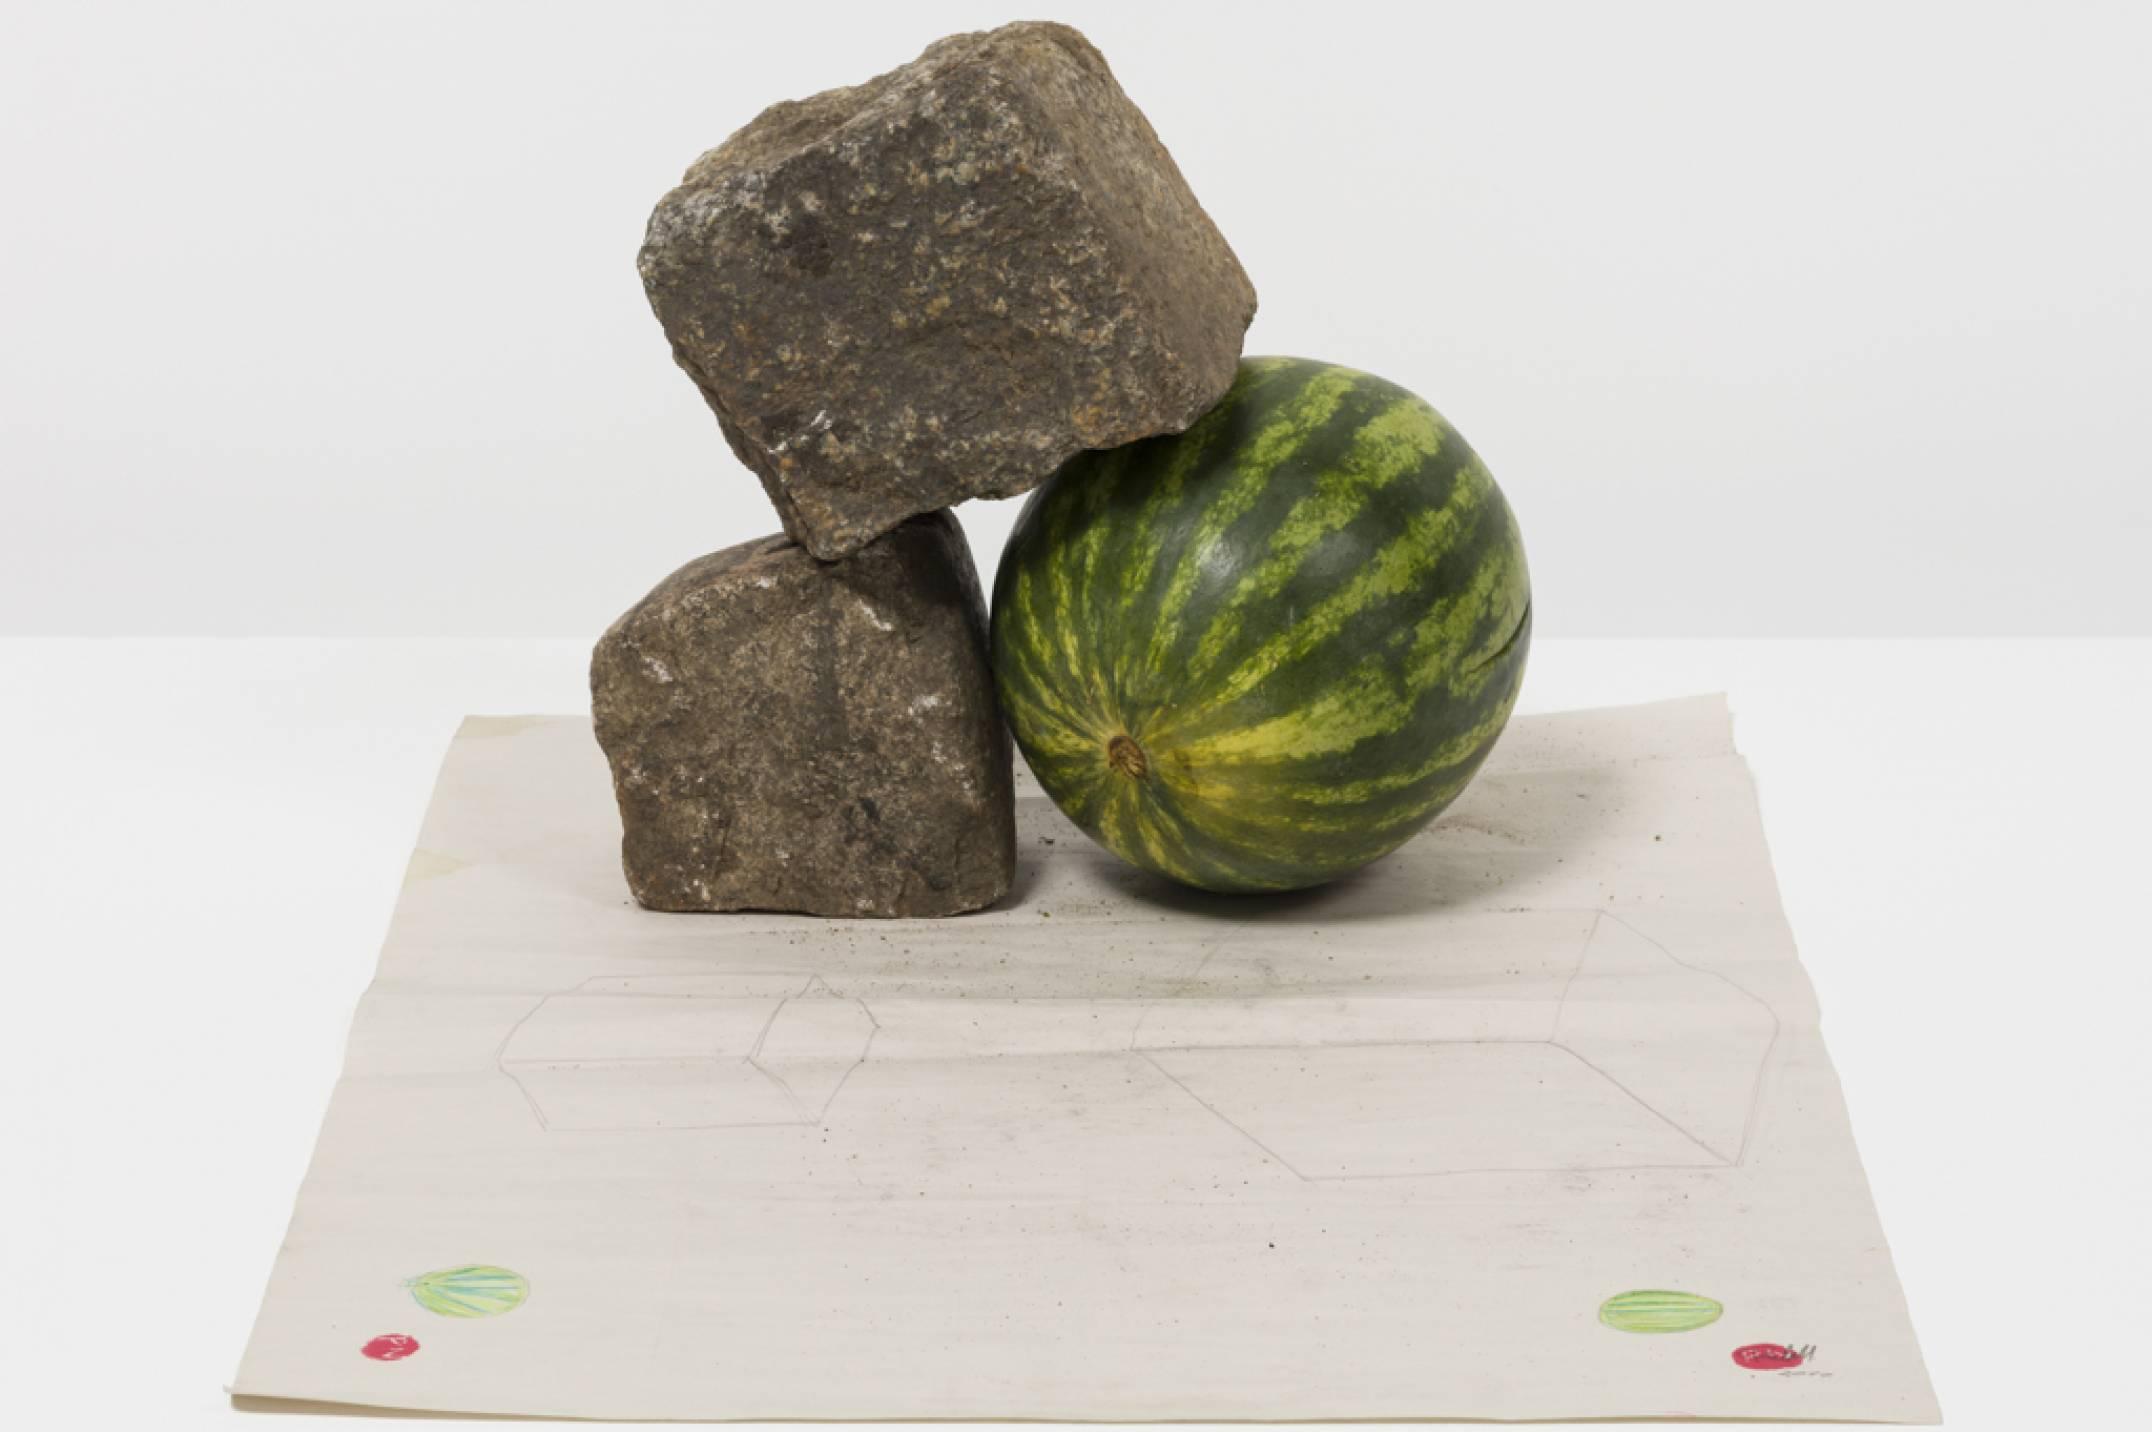 Paulo Nazareth,&nbsp;<em>CHINATOWN</em>, 2017, pencil on paper, stone, plastic bags, 12,7 × 94 × 70 cm - Mendes Wood DM